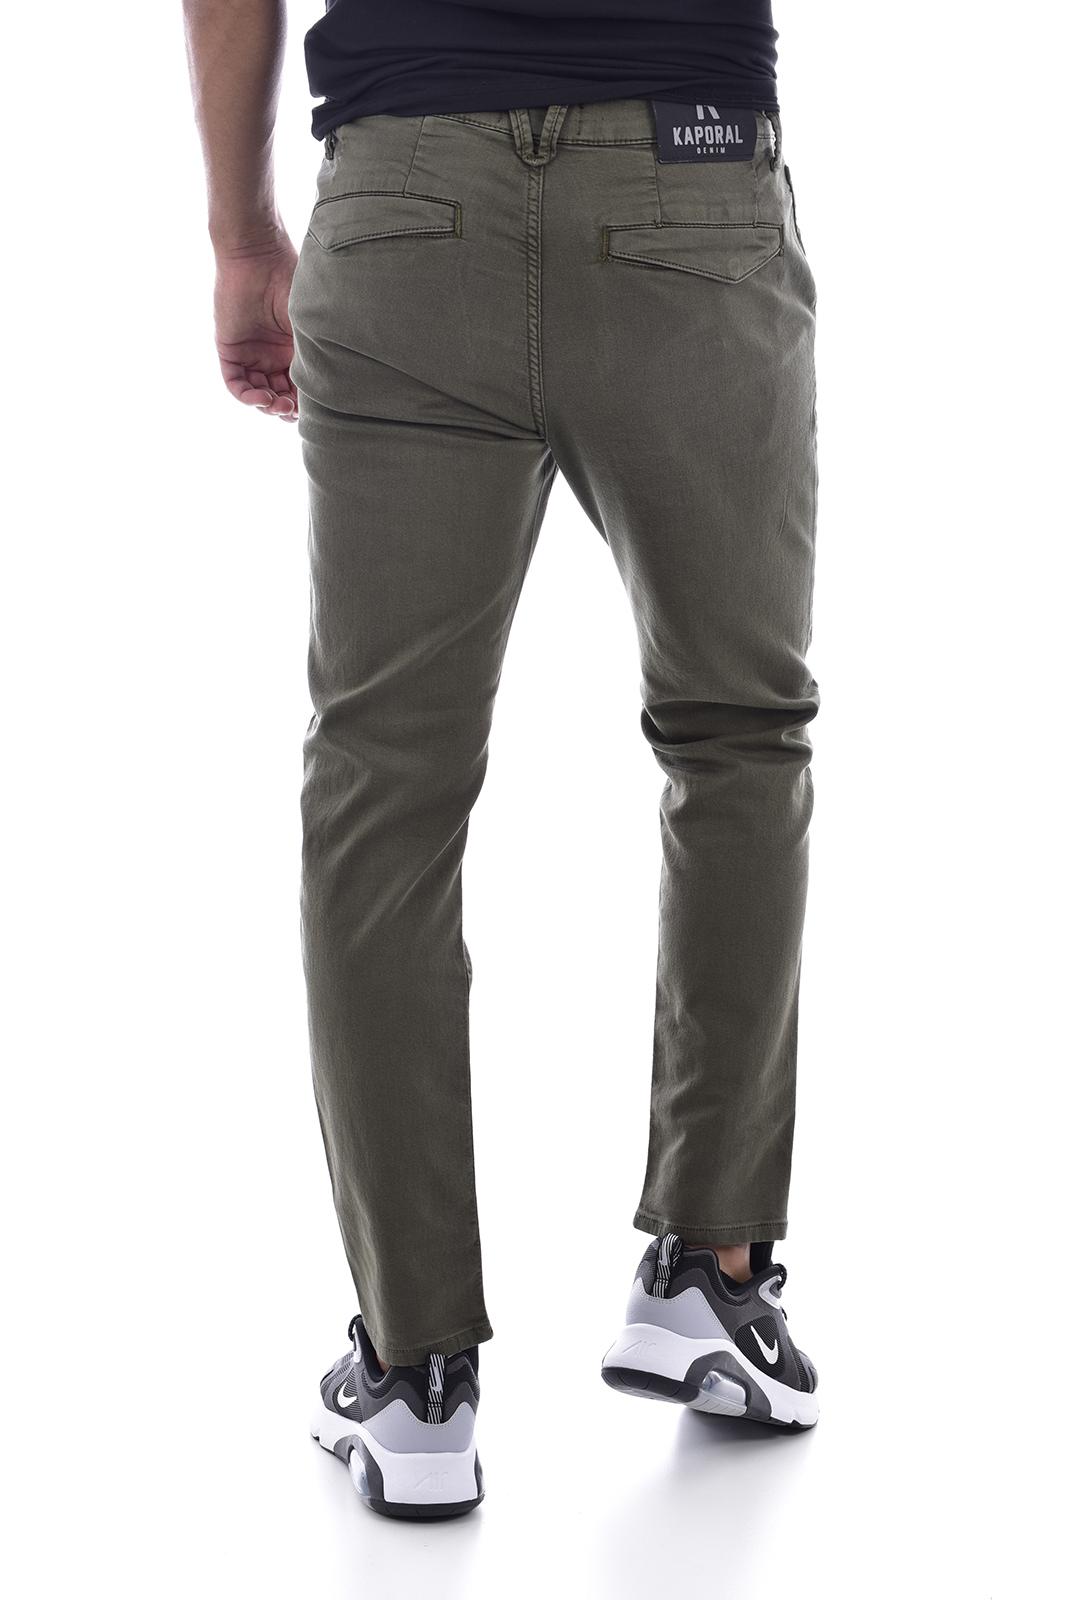 Pantalons chino/citadin  Kaporal IRWIX EXKAKI